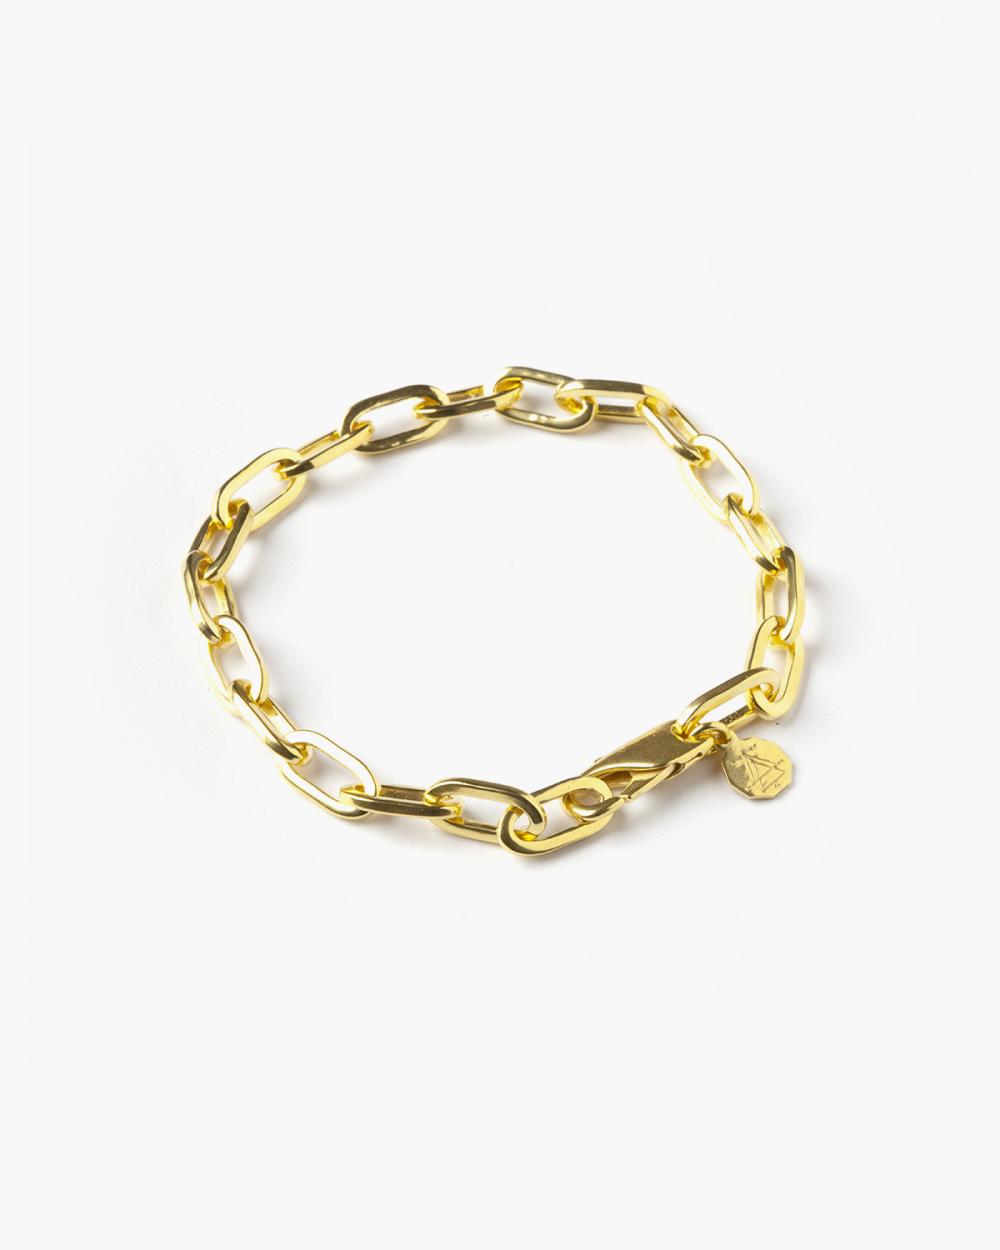 Bracelets YELLOW GOLD MEDIUM OVAL BOX CHAIN BRACELET NOVE25